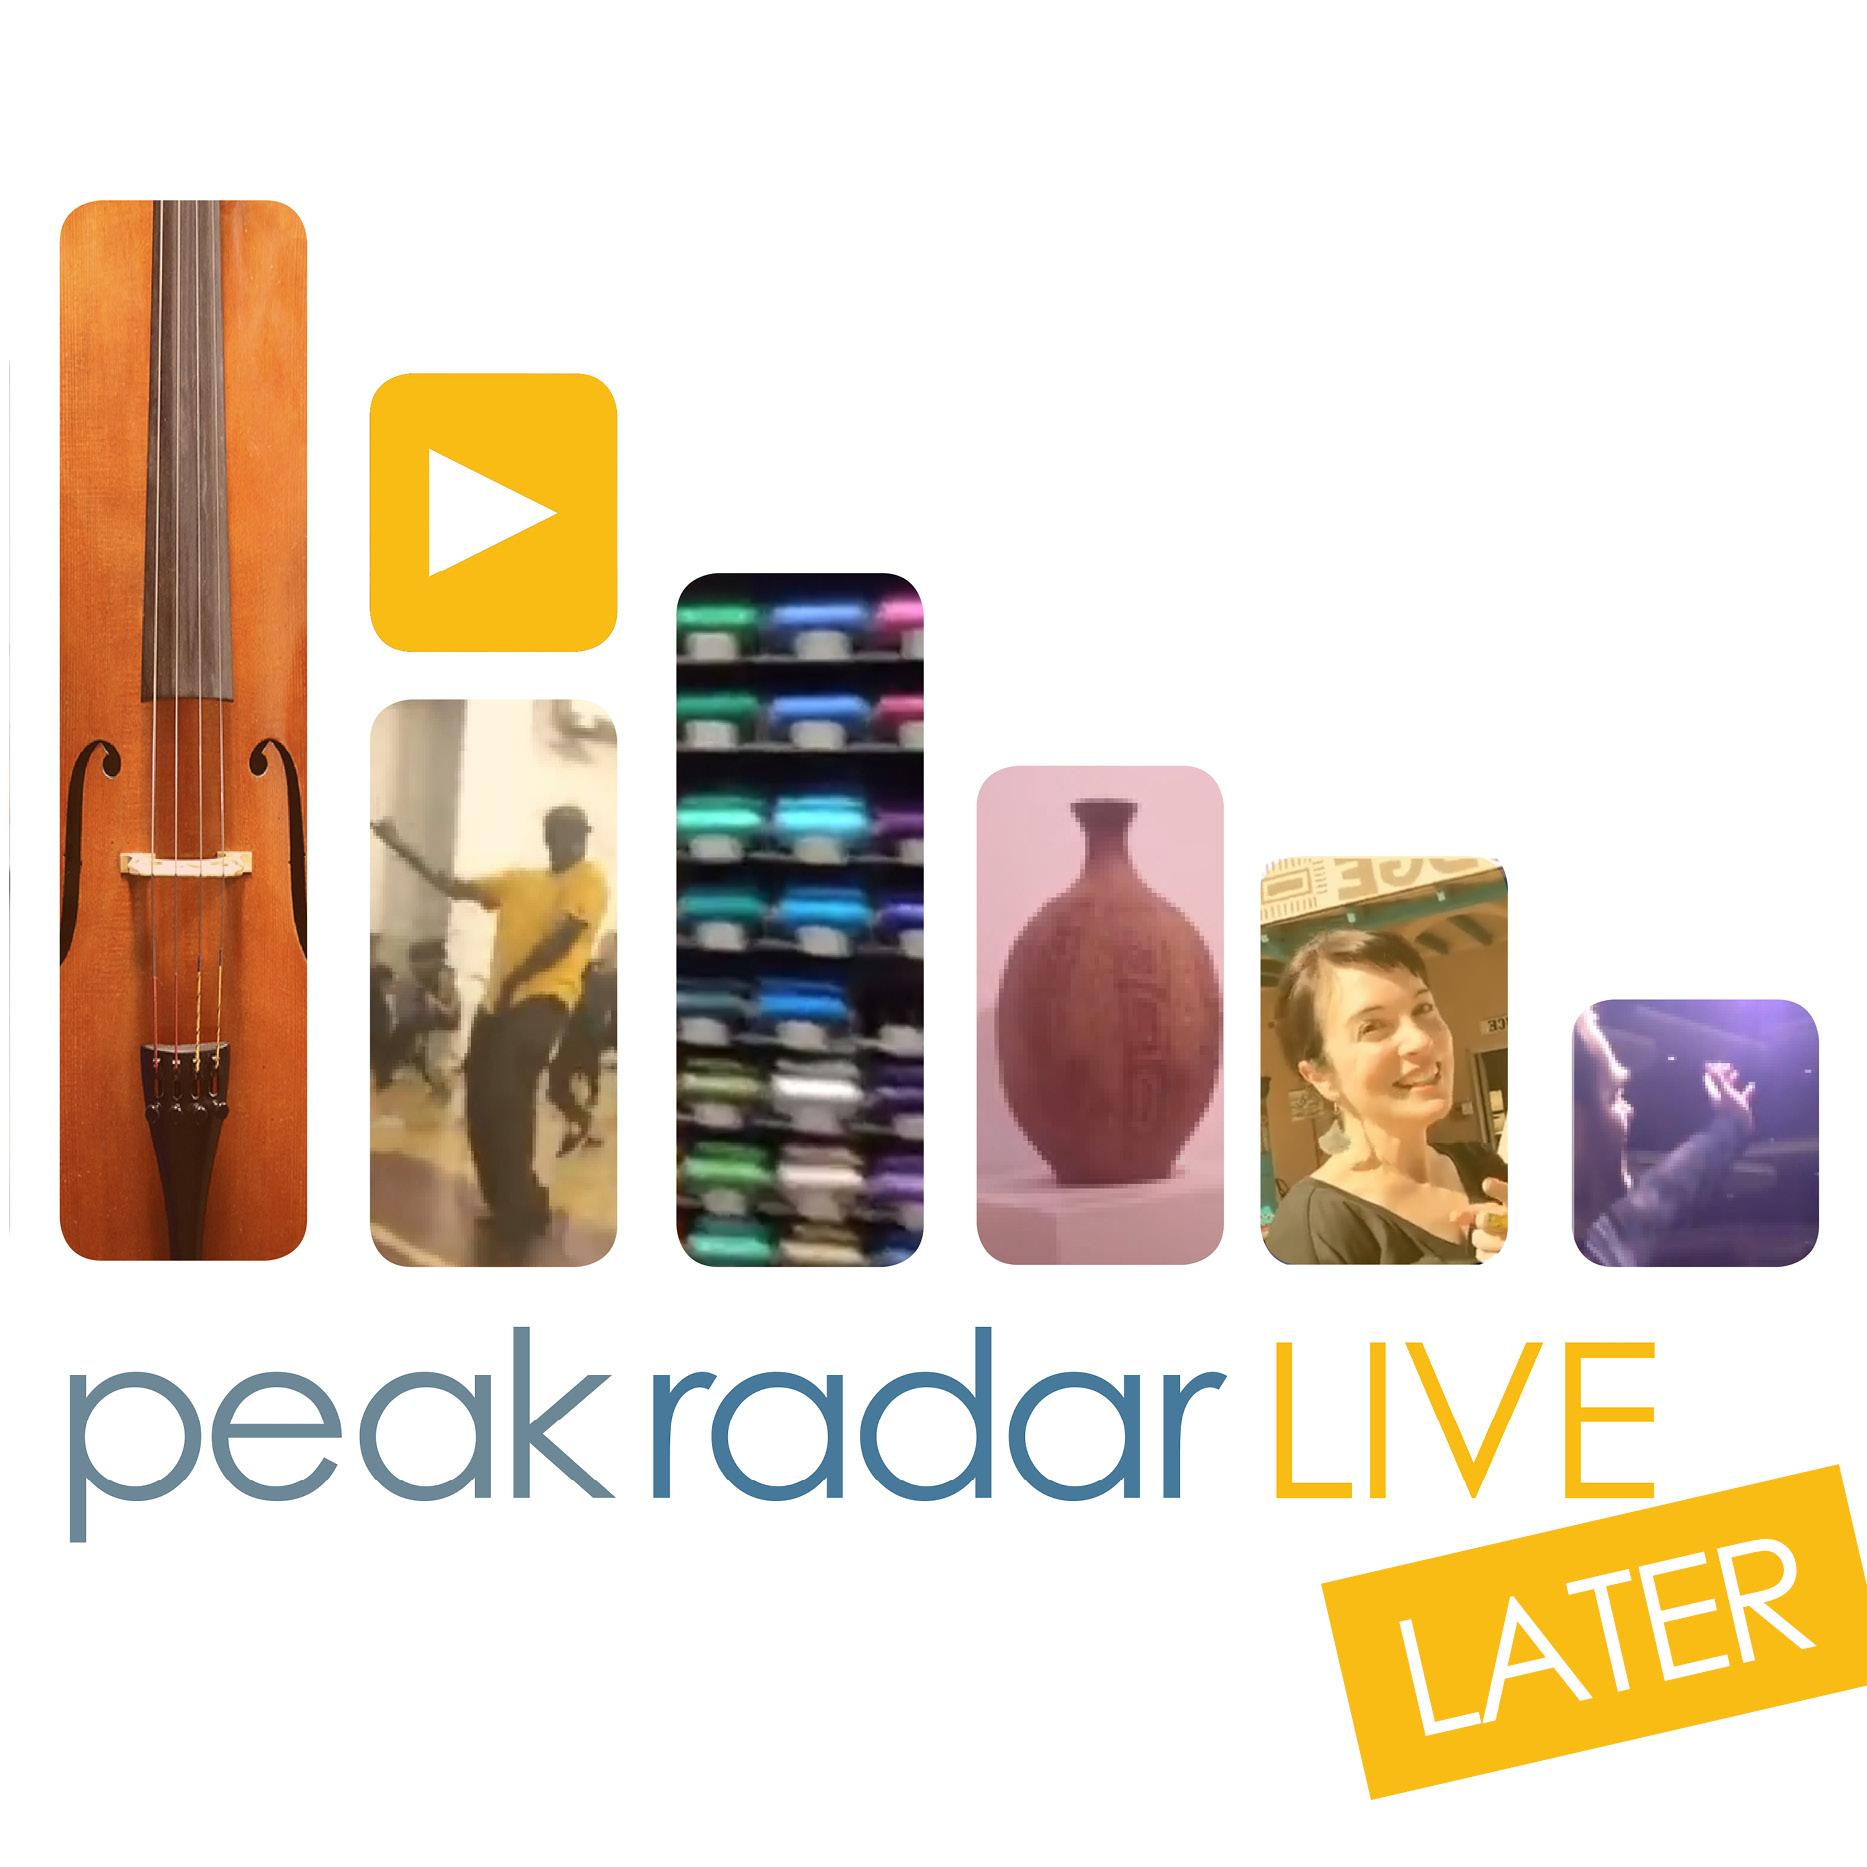 Peak Radar Live: Later